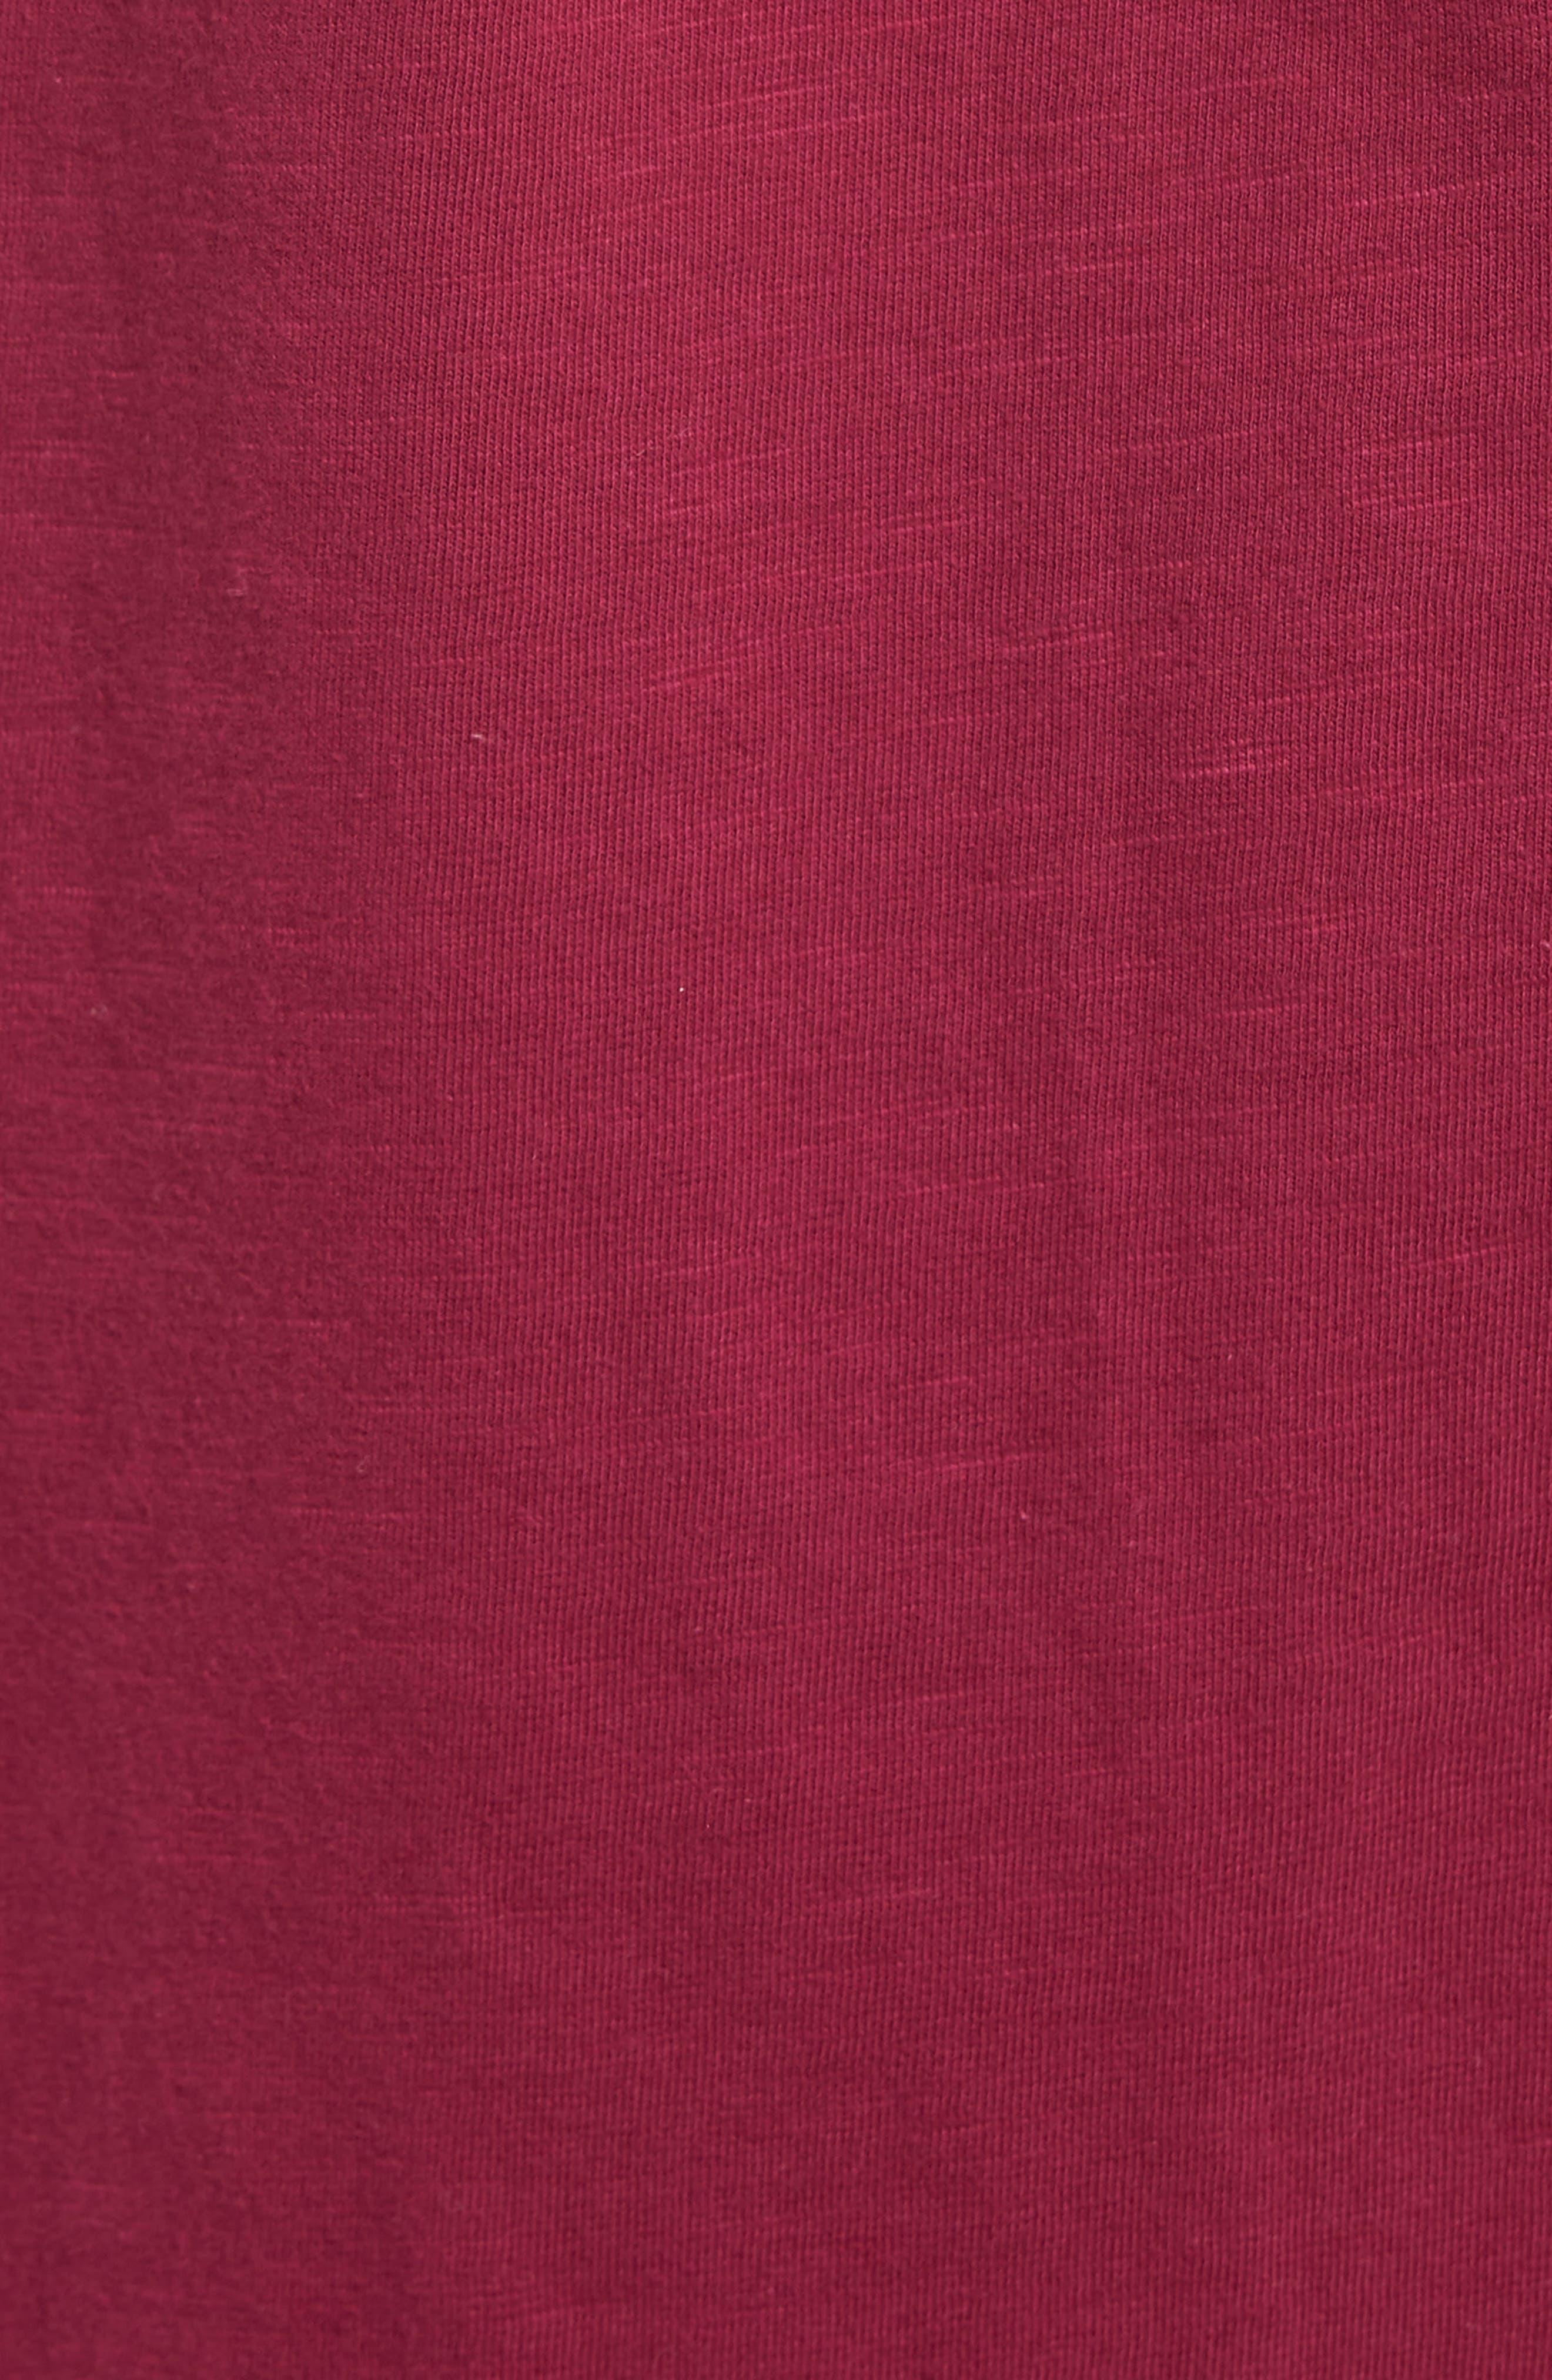 Tie Front Cotton Maxi Skirt,                             Alternate thumbnail 5, color,                             Purple Fuchsia